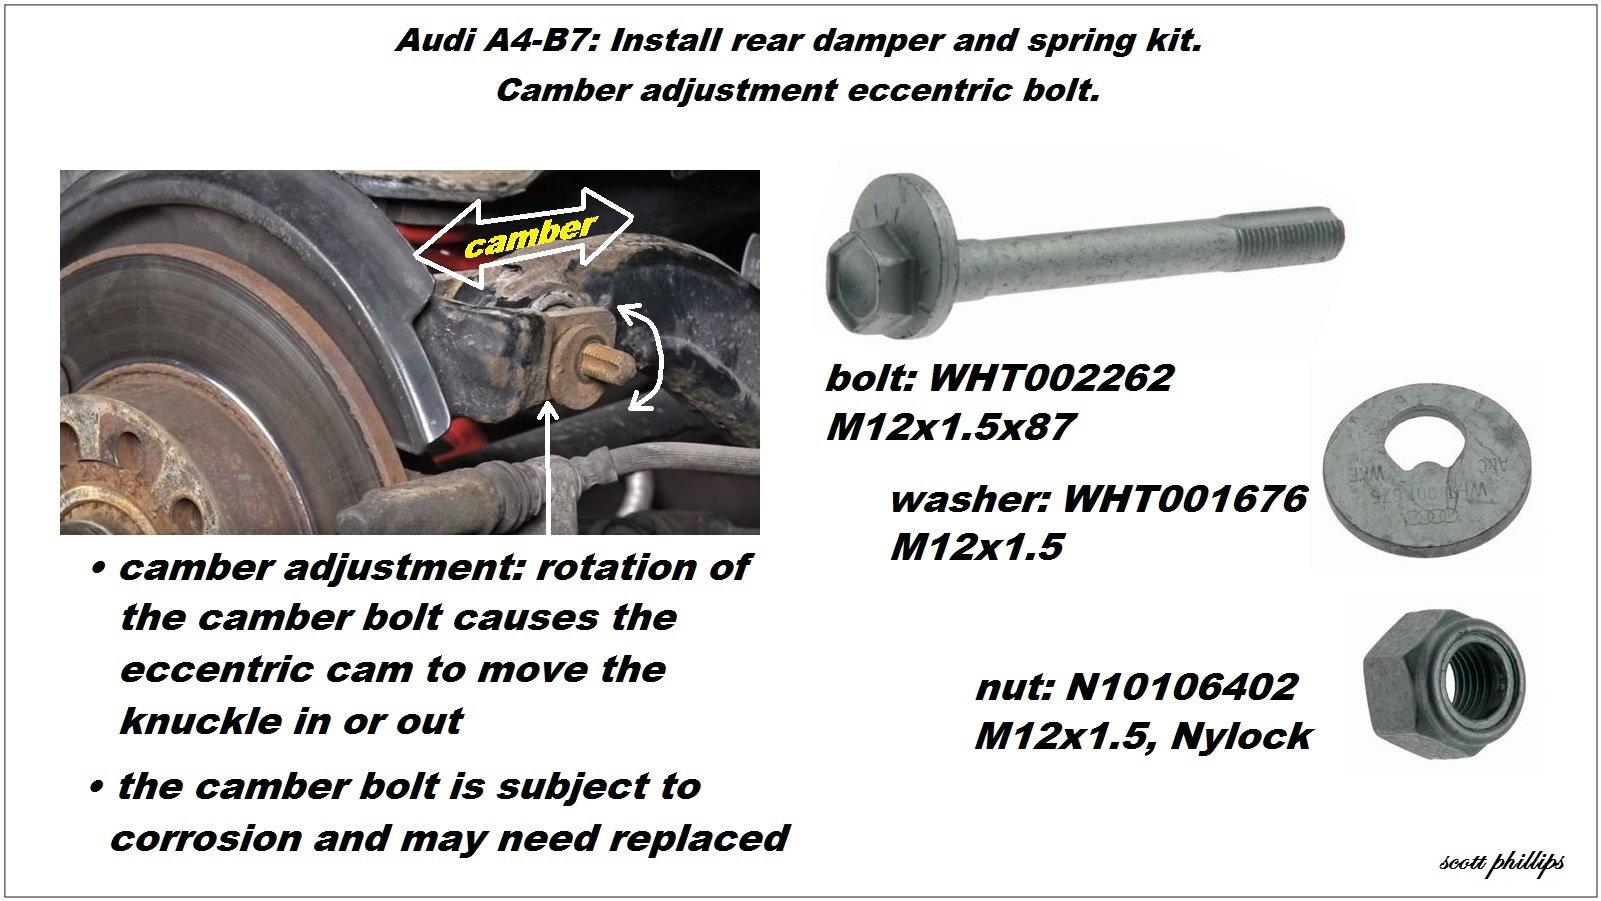 audi a4 b7 shock reviews and how to install shock absorber audiworld rh audiworld com 1995 Audi A4 2002 Audi A4